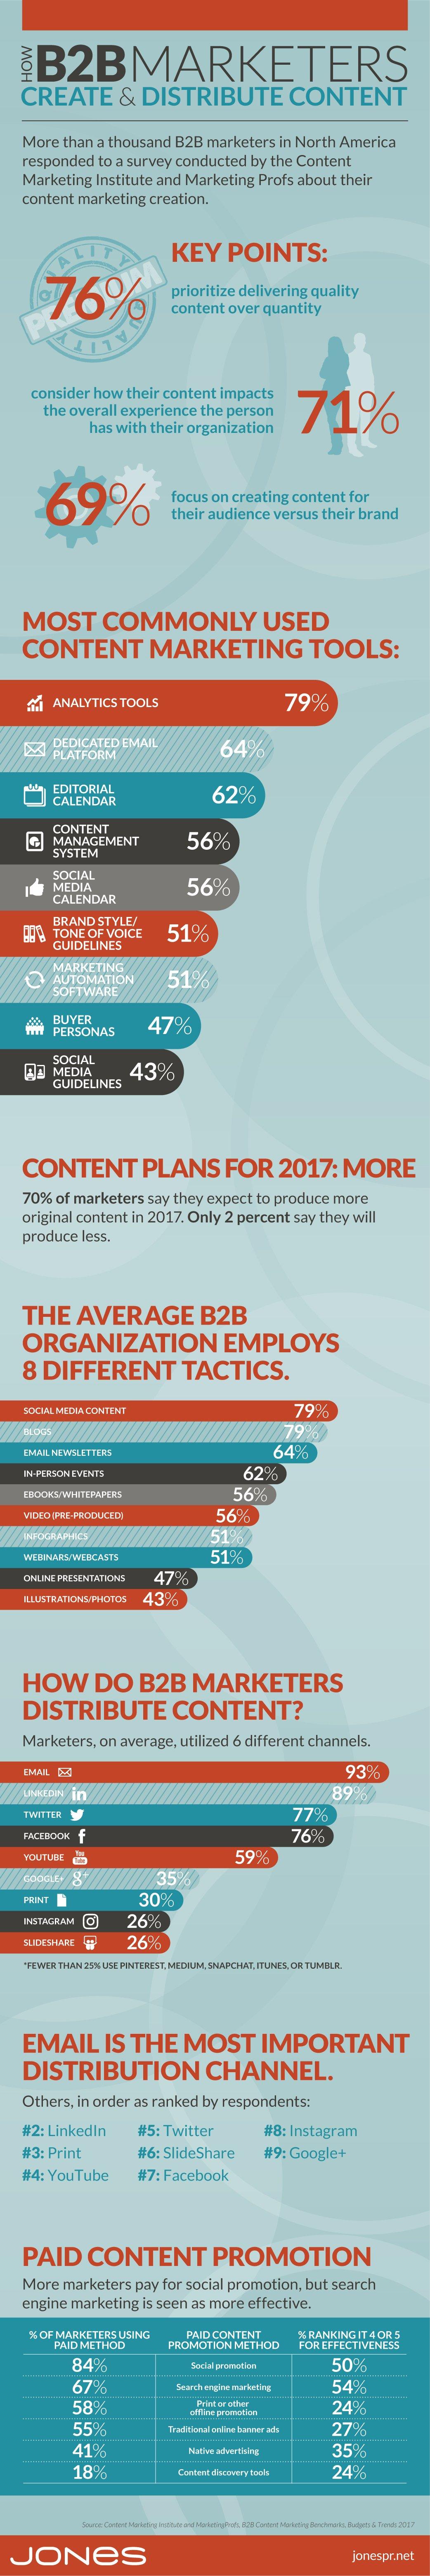 WB_024_JPR_Create-Distribute_Content_Infographic copy